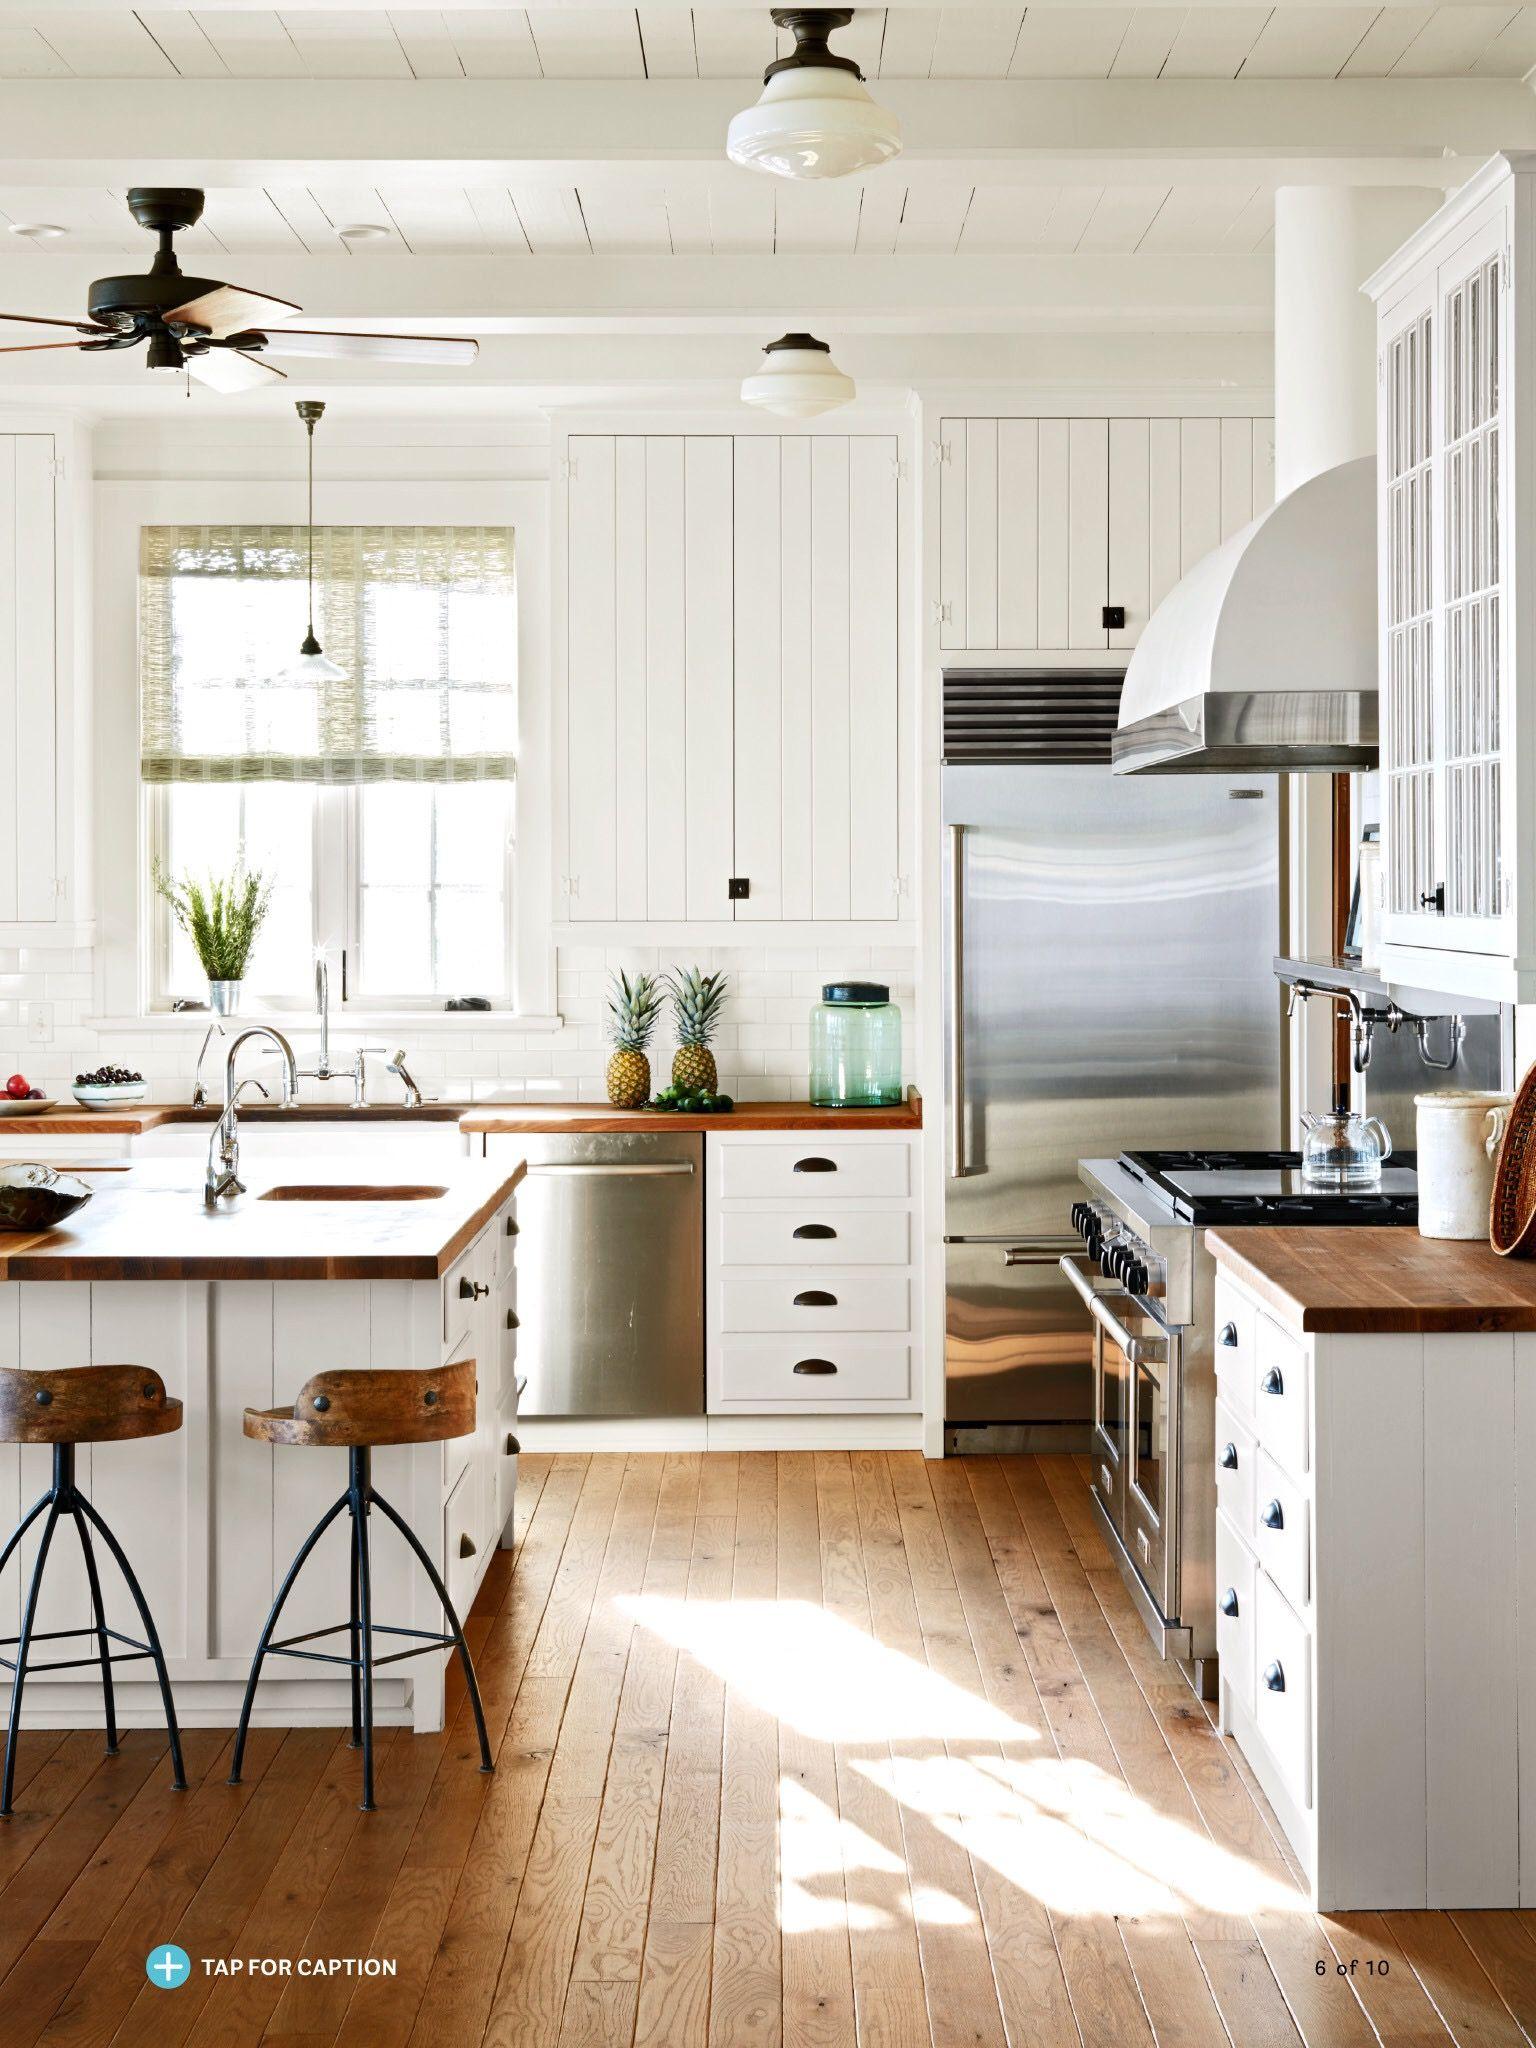 Pin by morgan corgi on kitchen pinterest kitchens house and